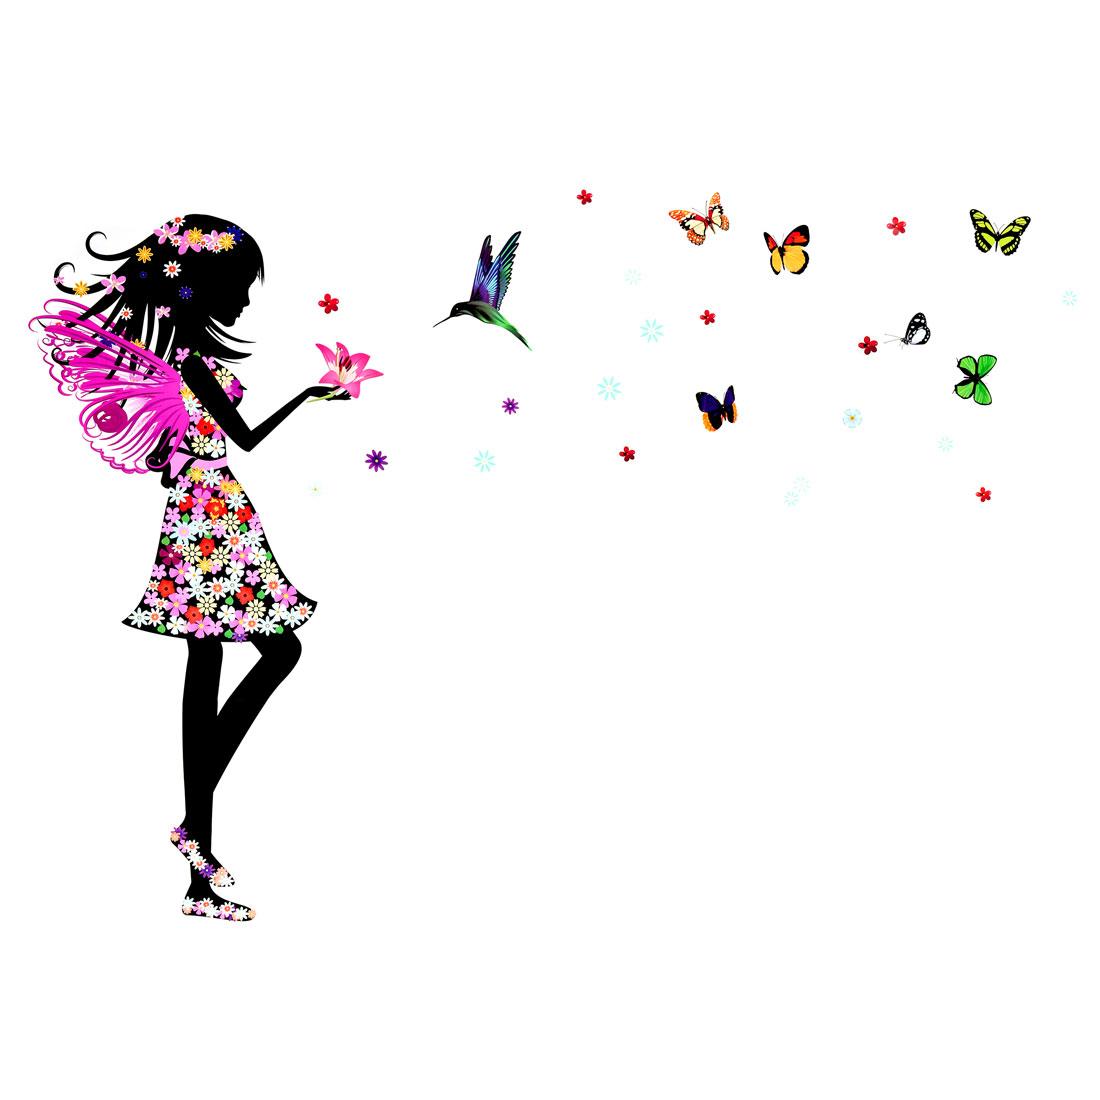 Butterfly Flower Girl Pattern Wall Sticker Removable Art Vinyl Decal DIY Home